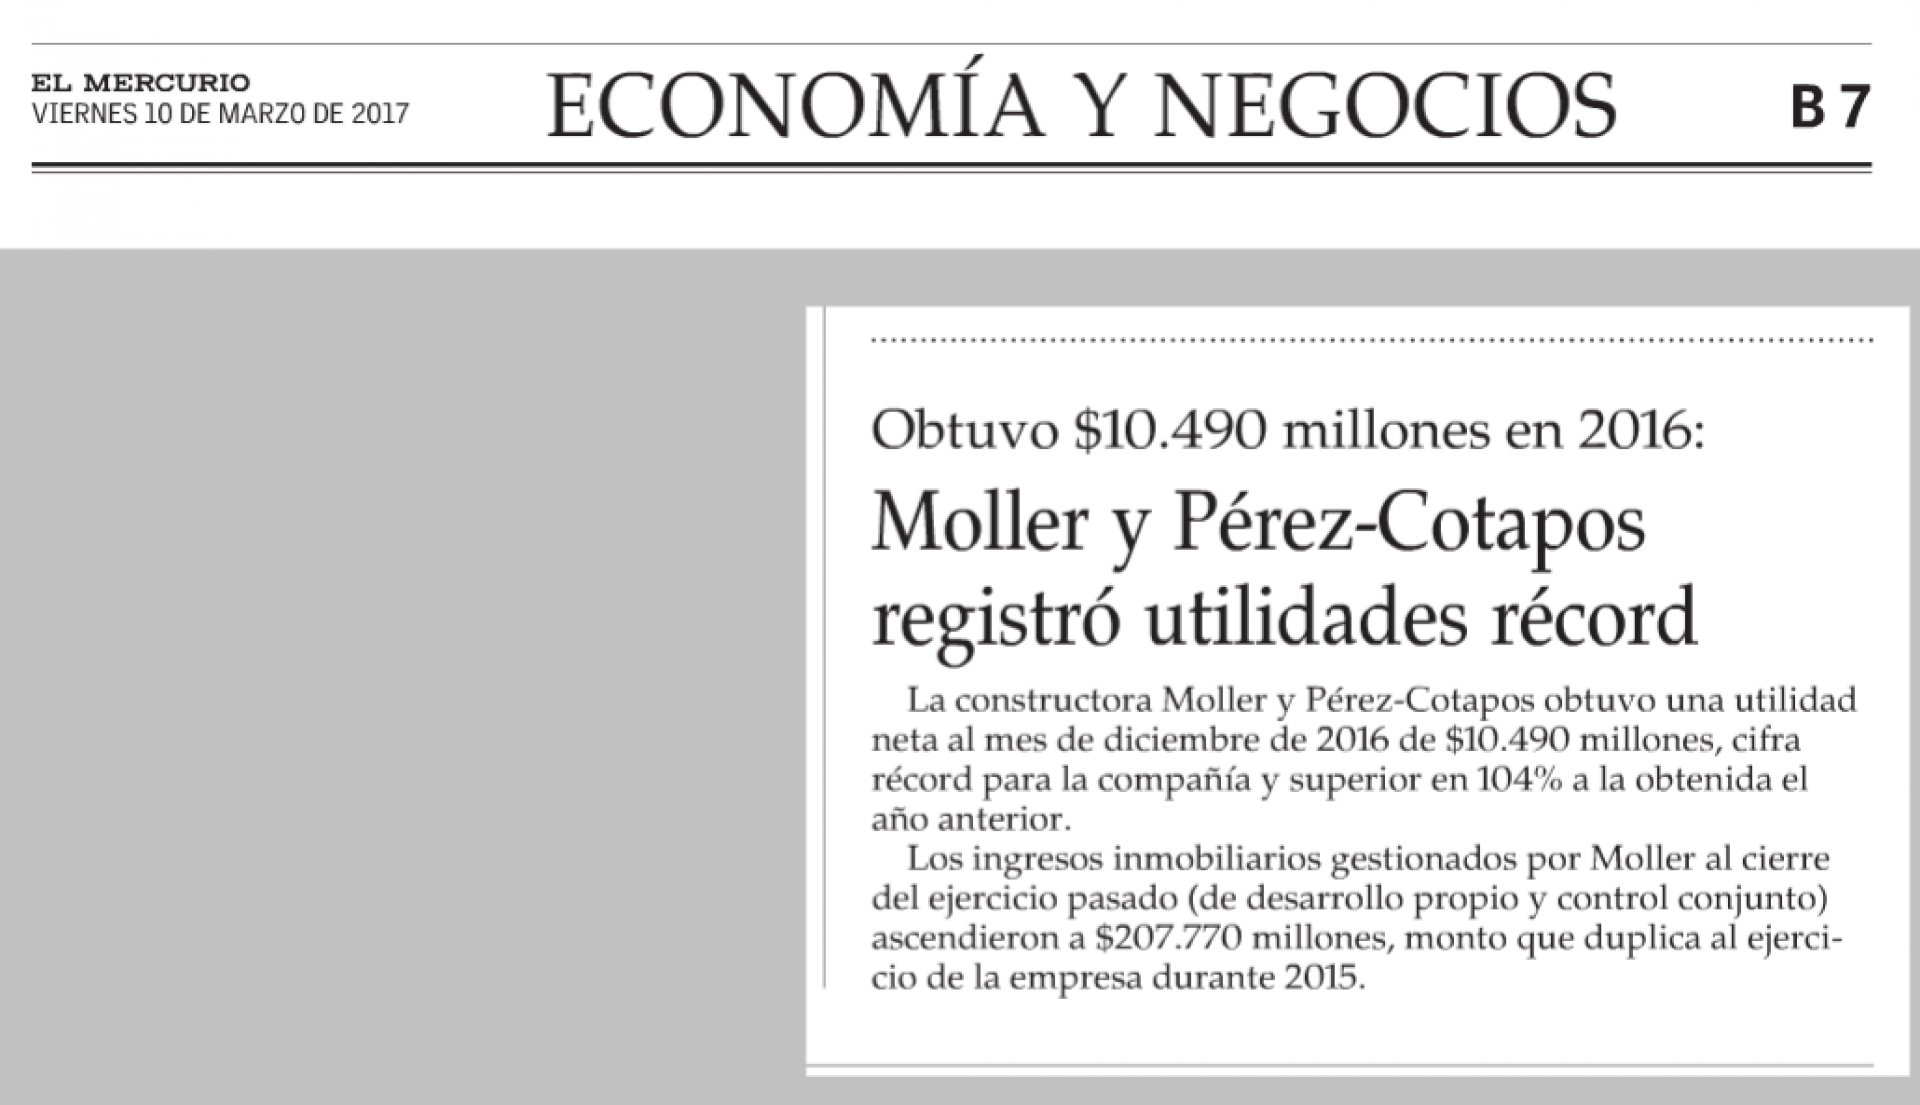 Moller y Pérez-Cotapos registró utilidades récord